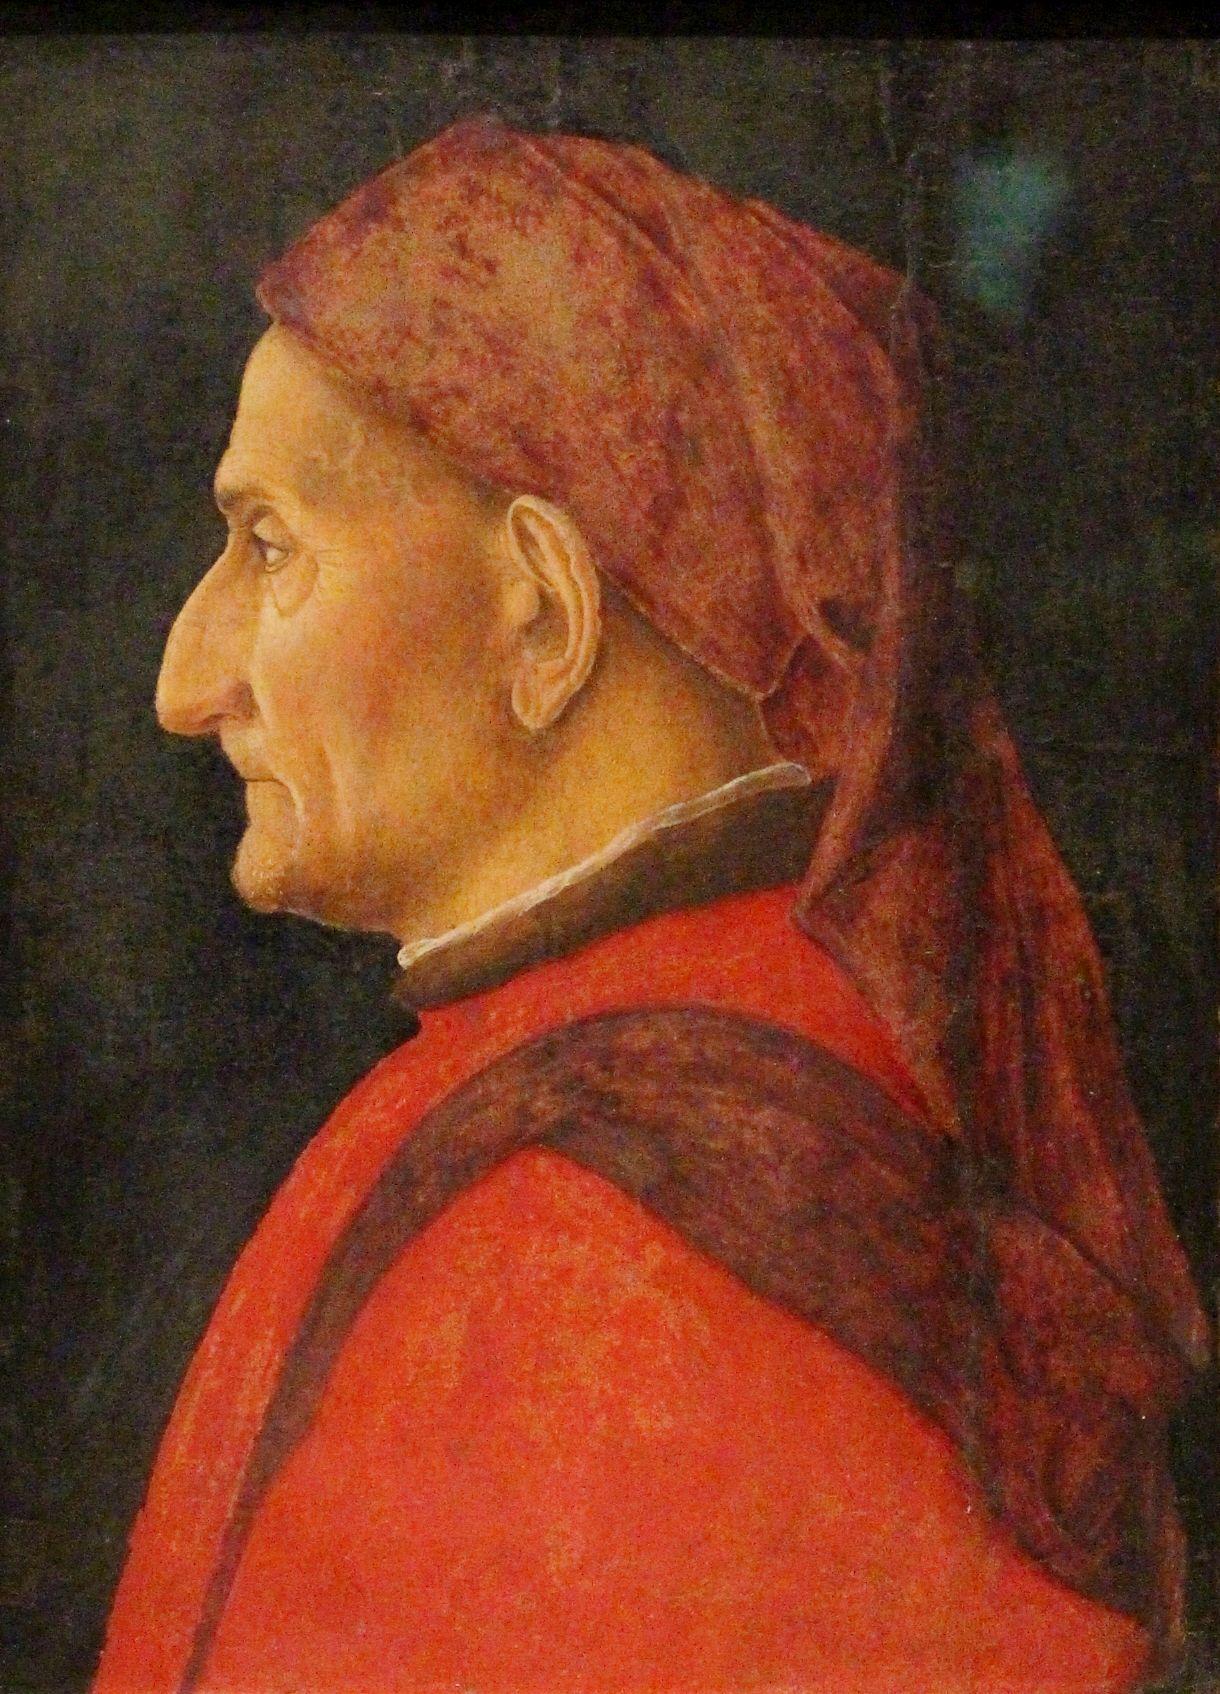 Portrait of a Man | Andrea Mantegna | Oil Painting